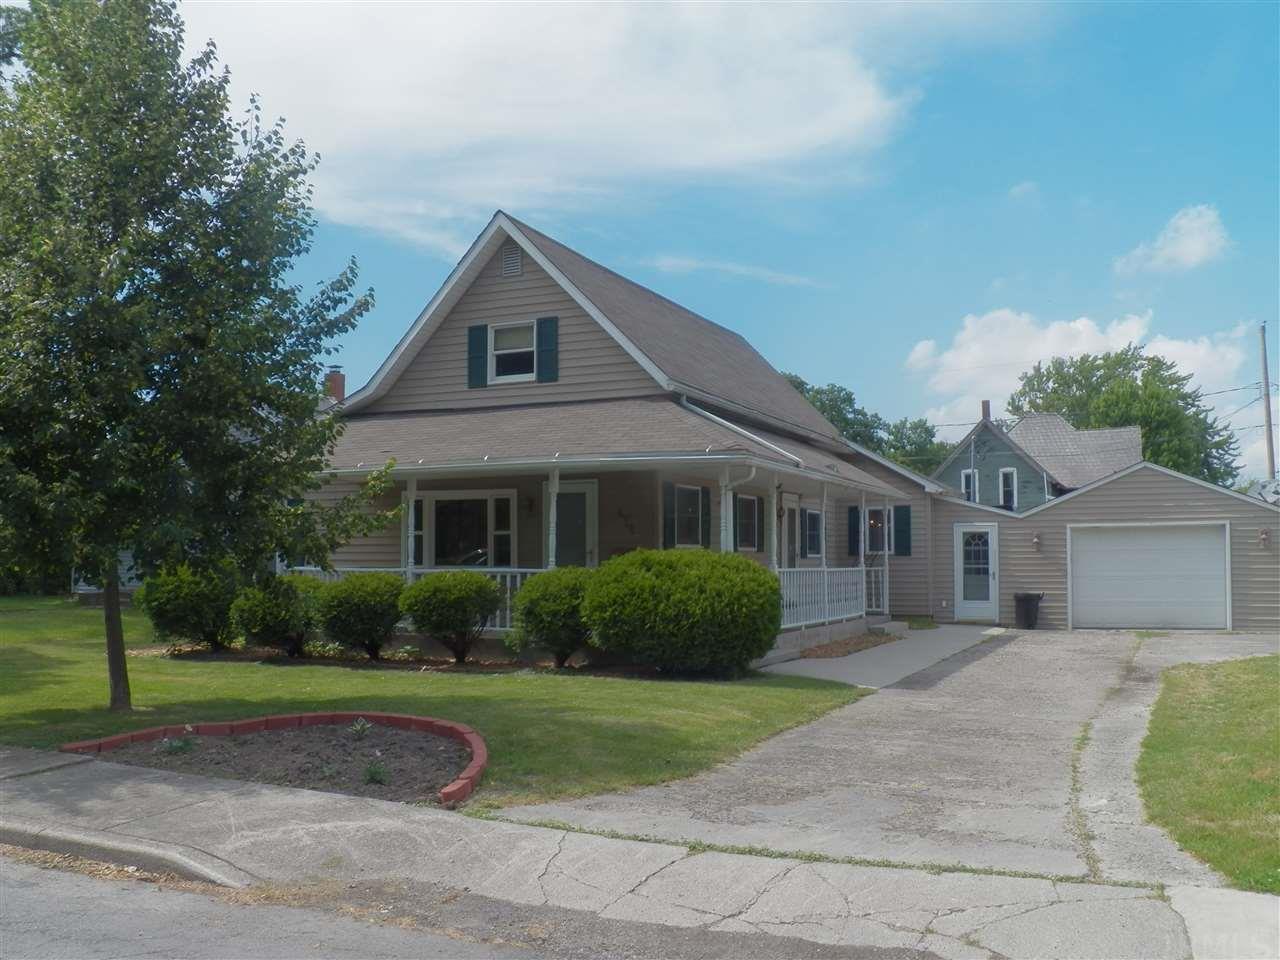 418 W John's, Decatur, IN 46733